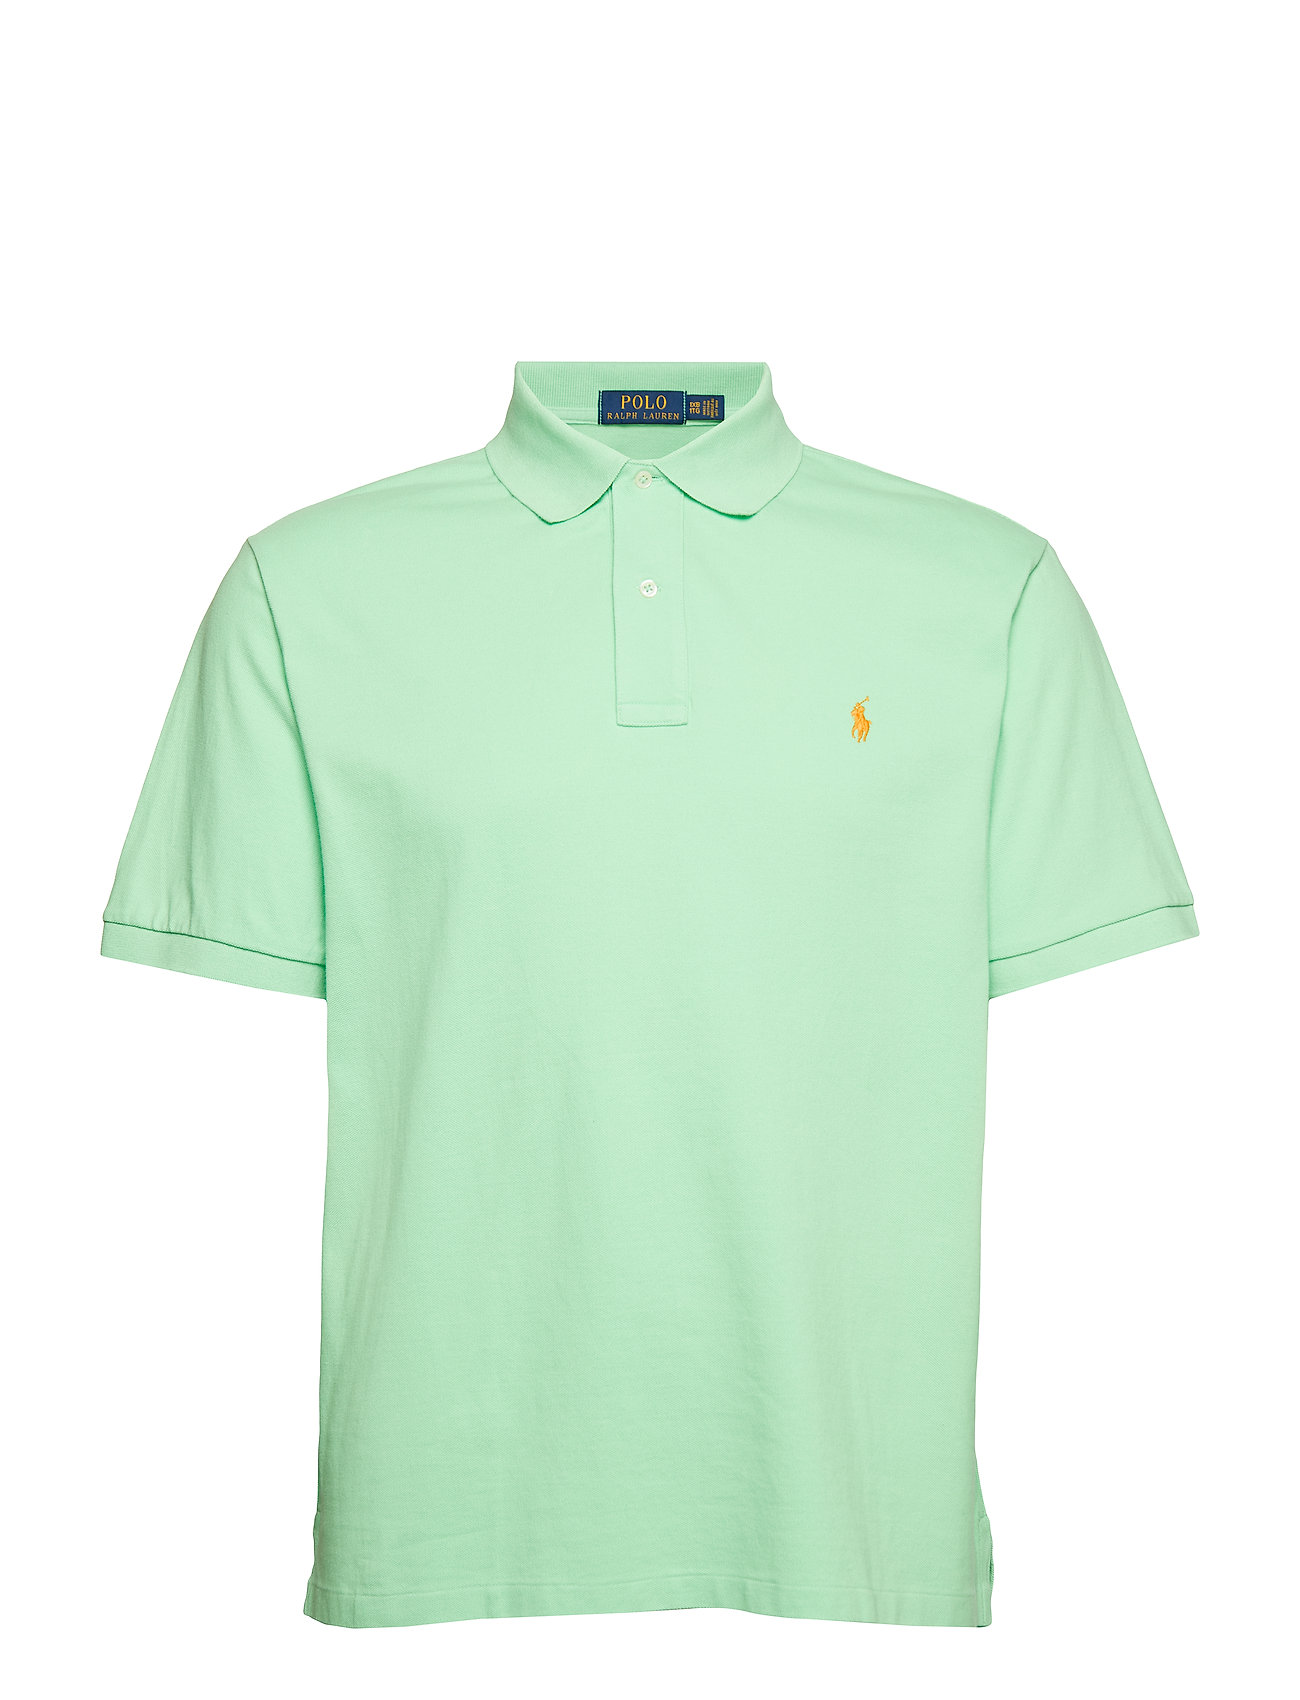 Polo Ralph Lauren Big & Tall Classic Fit Mesh Polo Shirt - NEW LIME